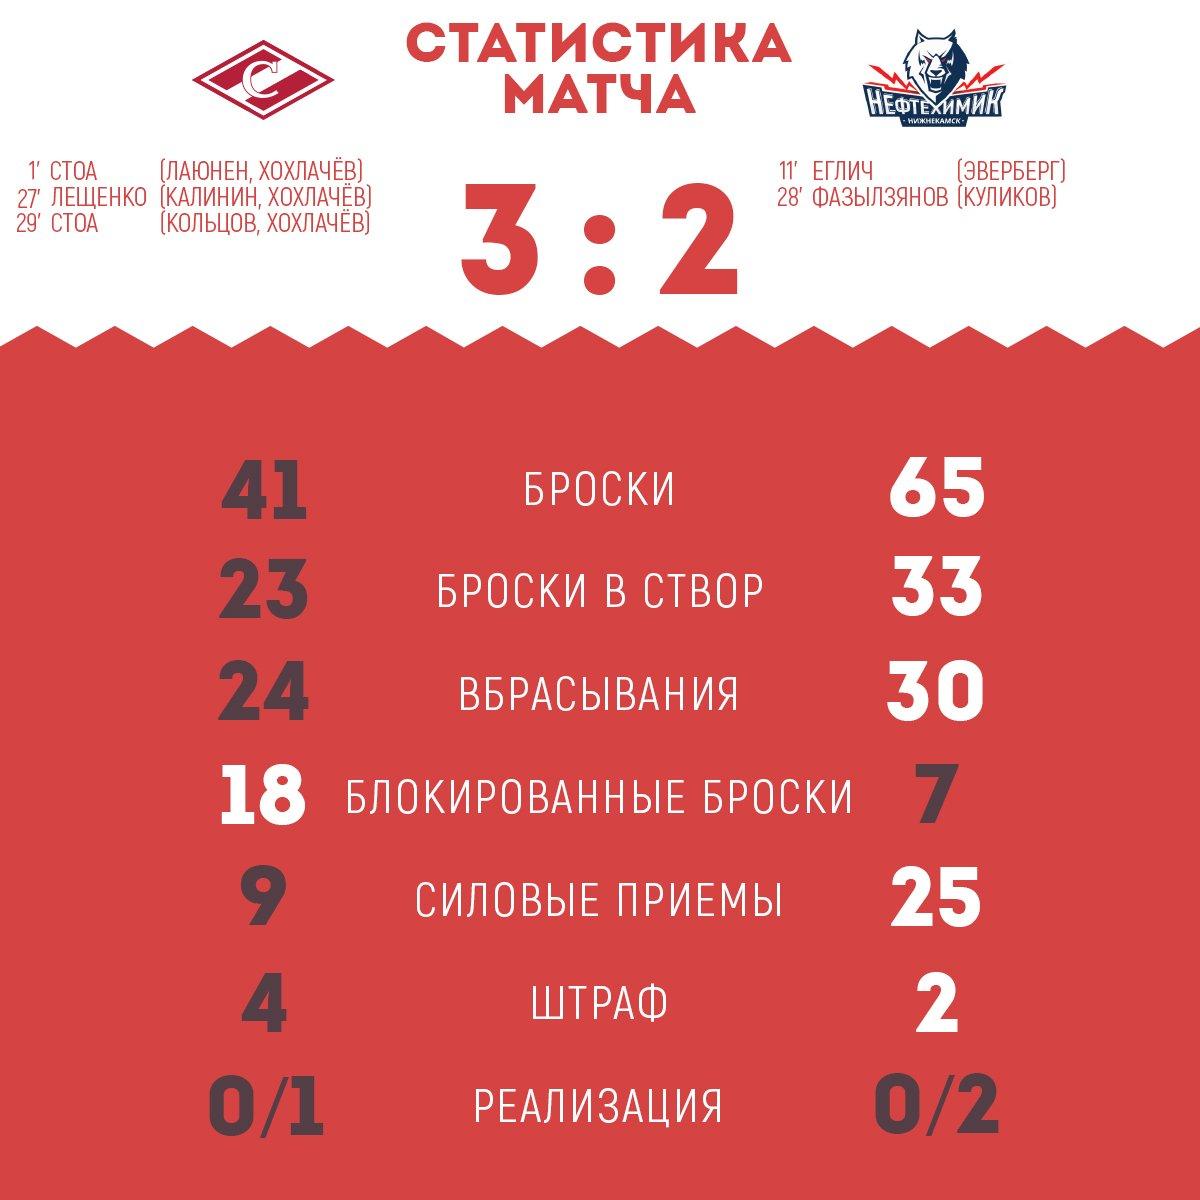 Статистика матча «Спартак» - «Нефтехимик» 3:2